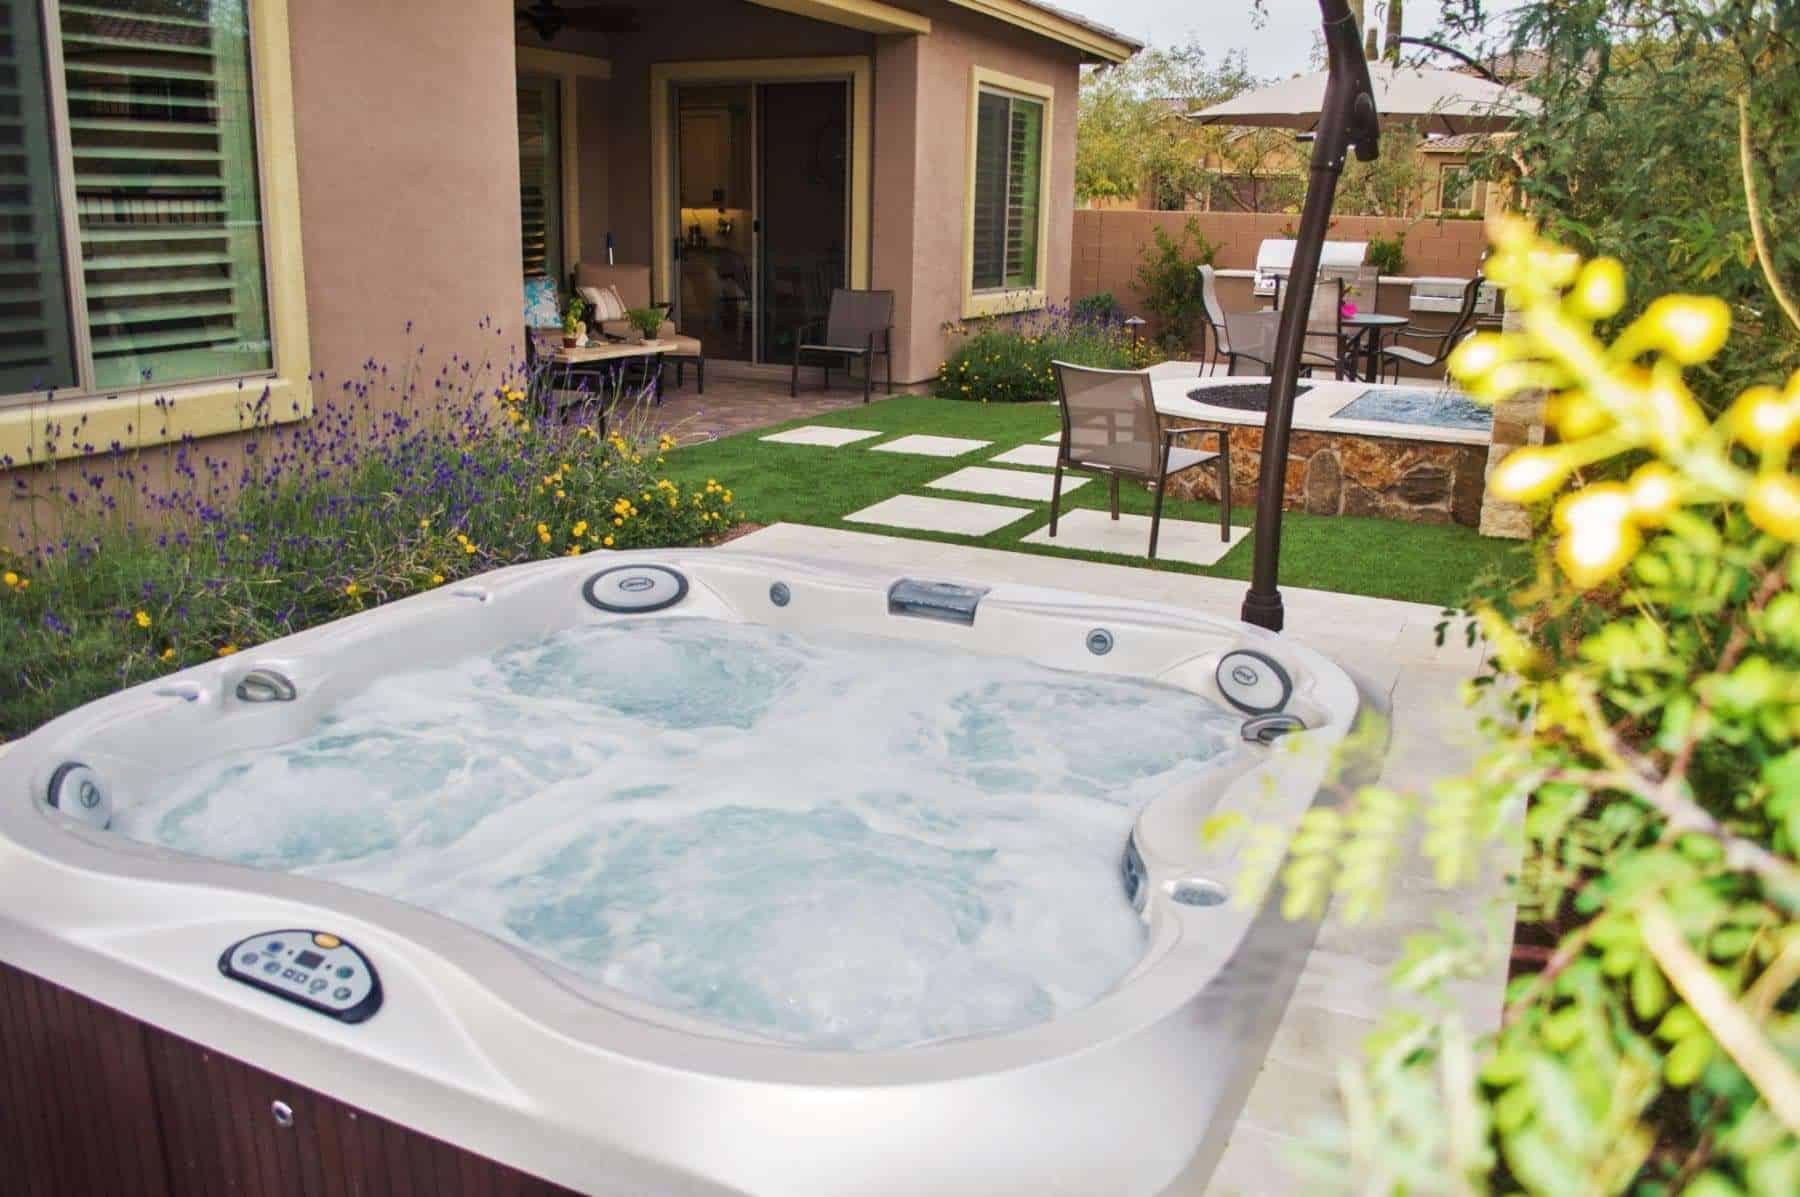 Imagine Backyard Living Jacuzzi Hot Tub